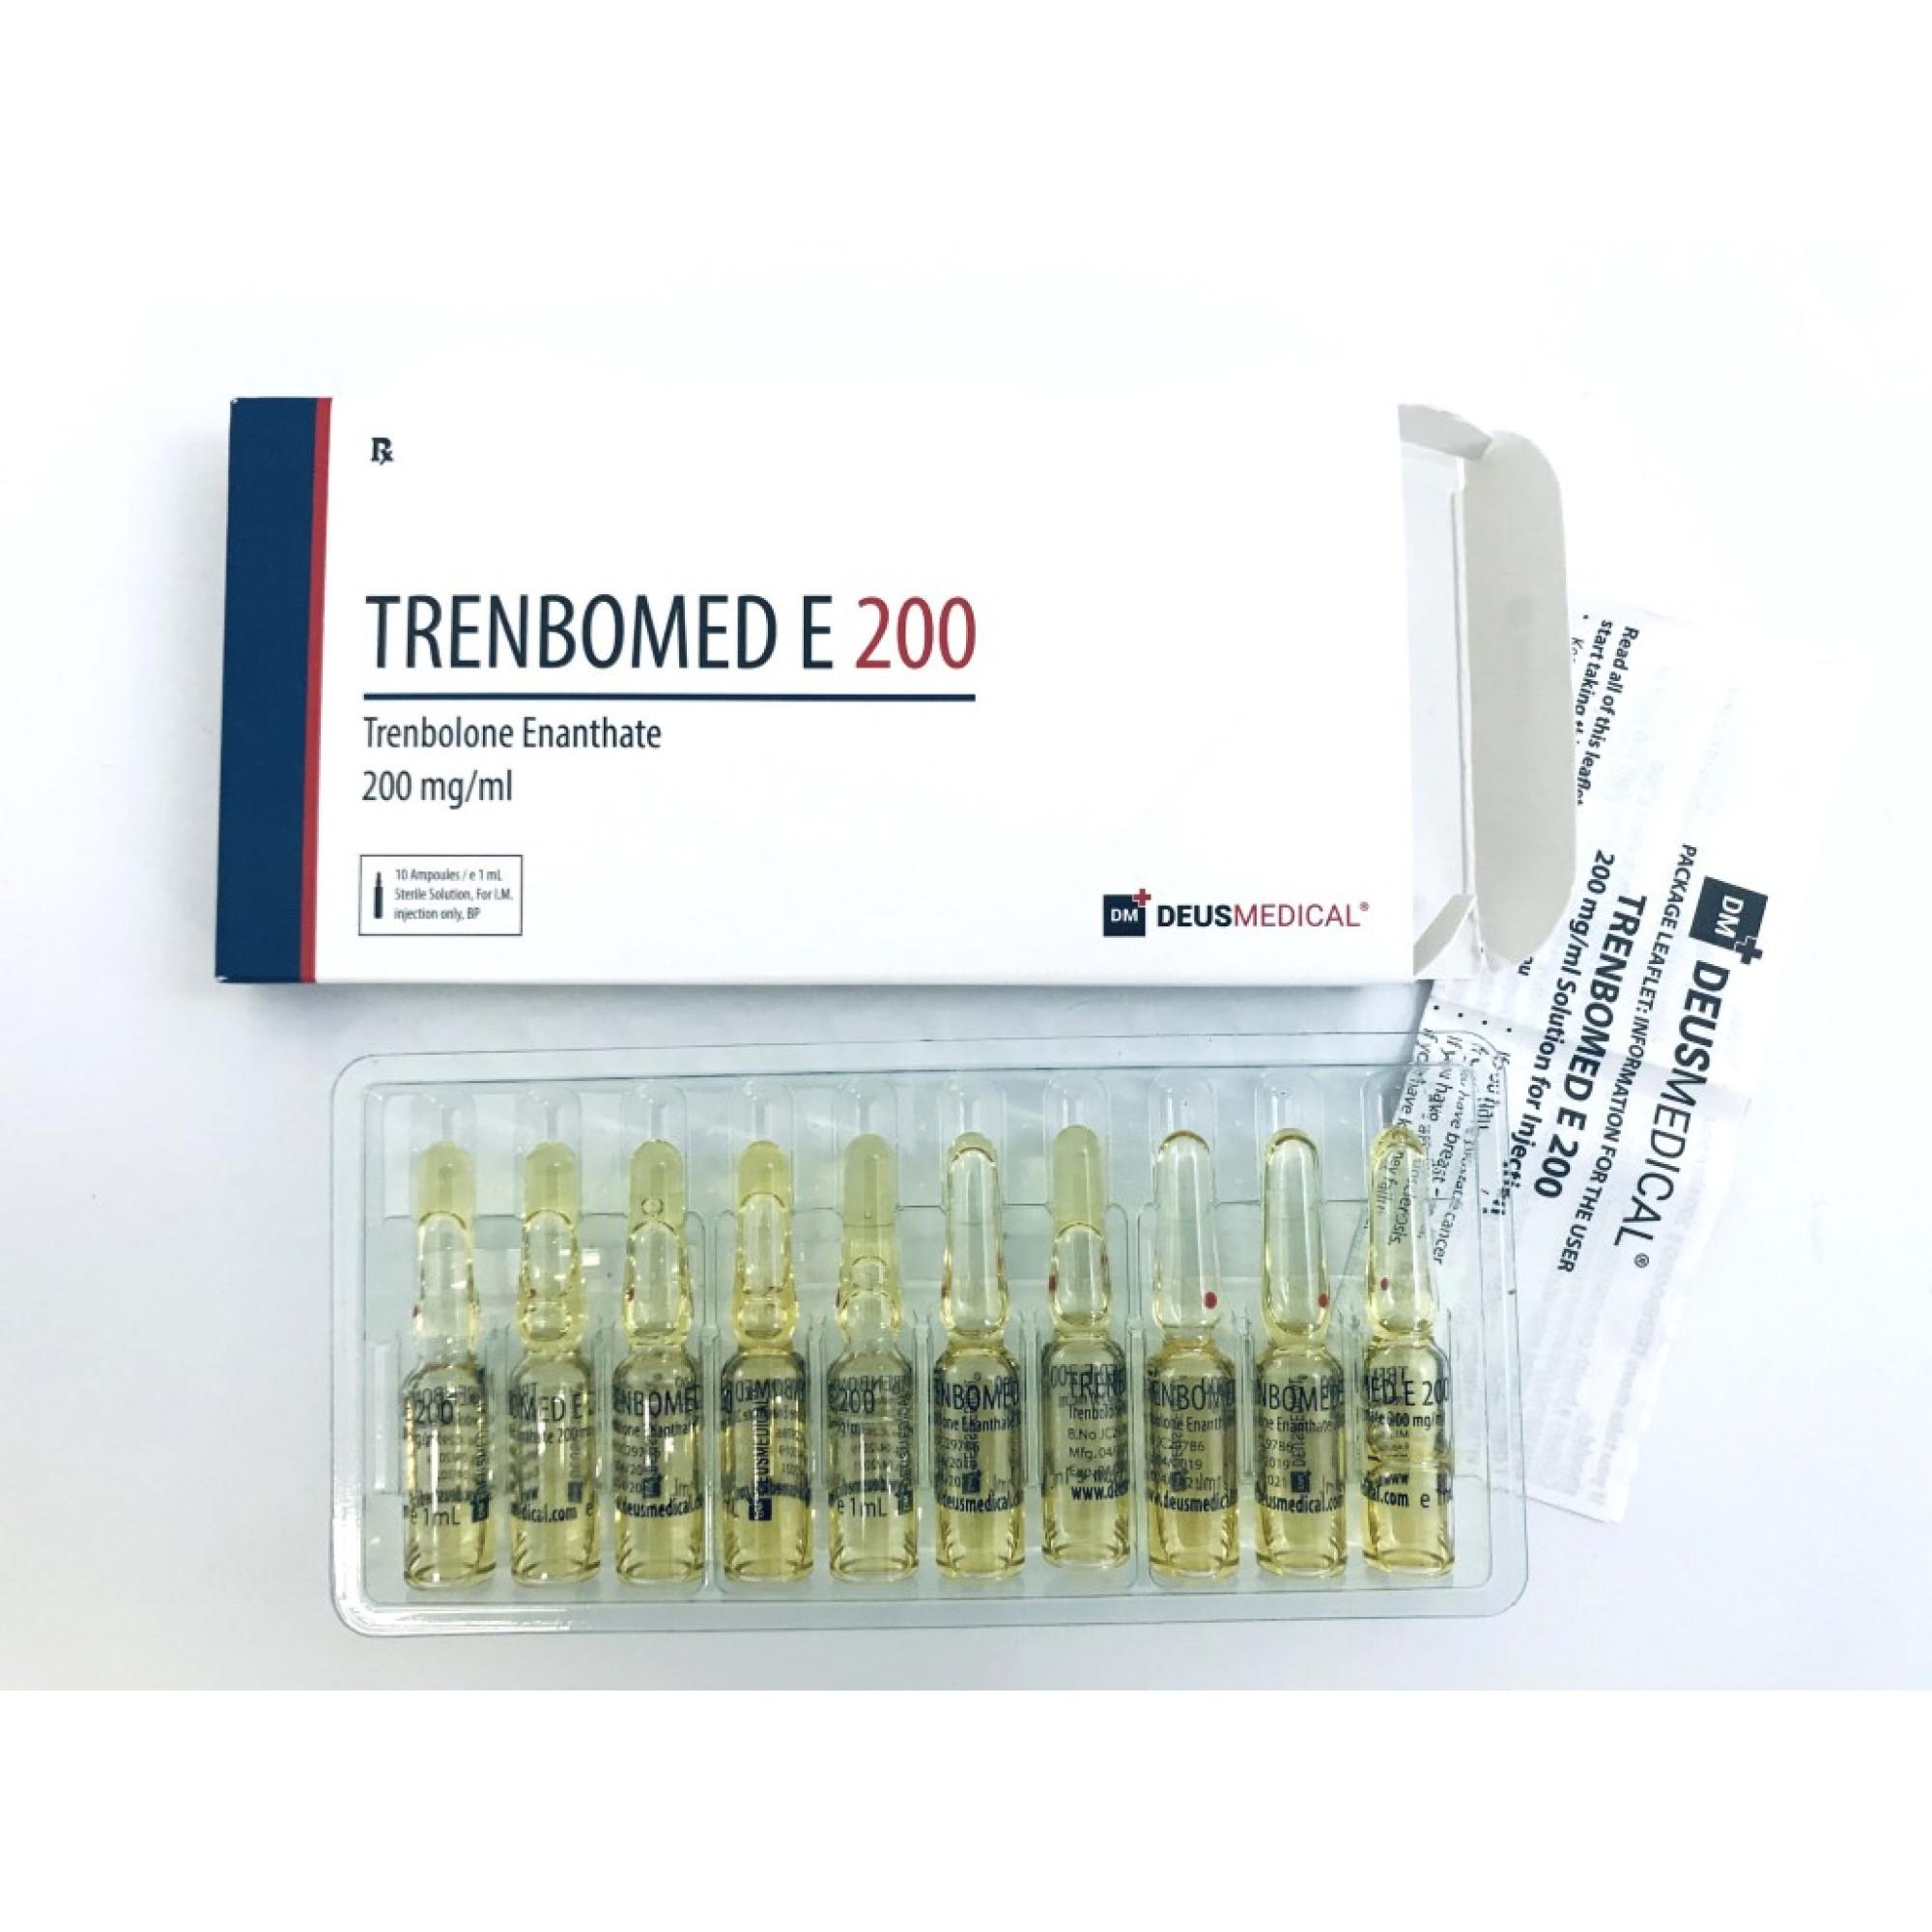 TRENBOMED E 200 (Trenbolone Enanthate), DEUS MEDICAL, BUY STEROIDS ONLINE - www.DEUSPOWER.com